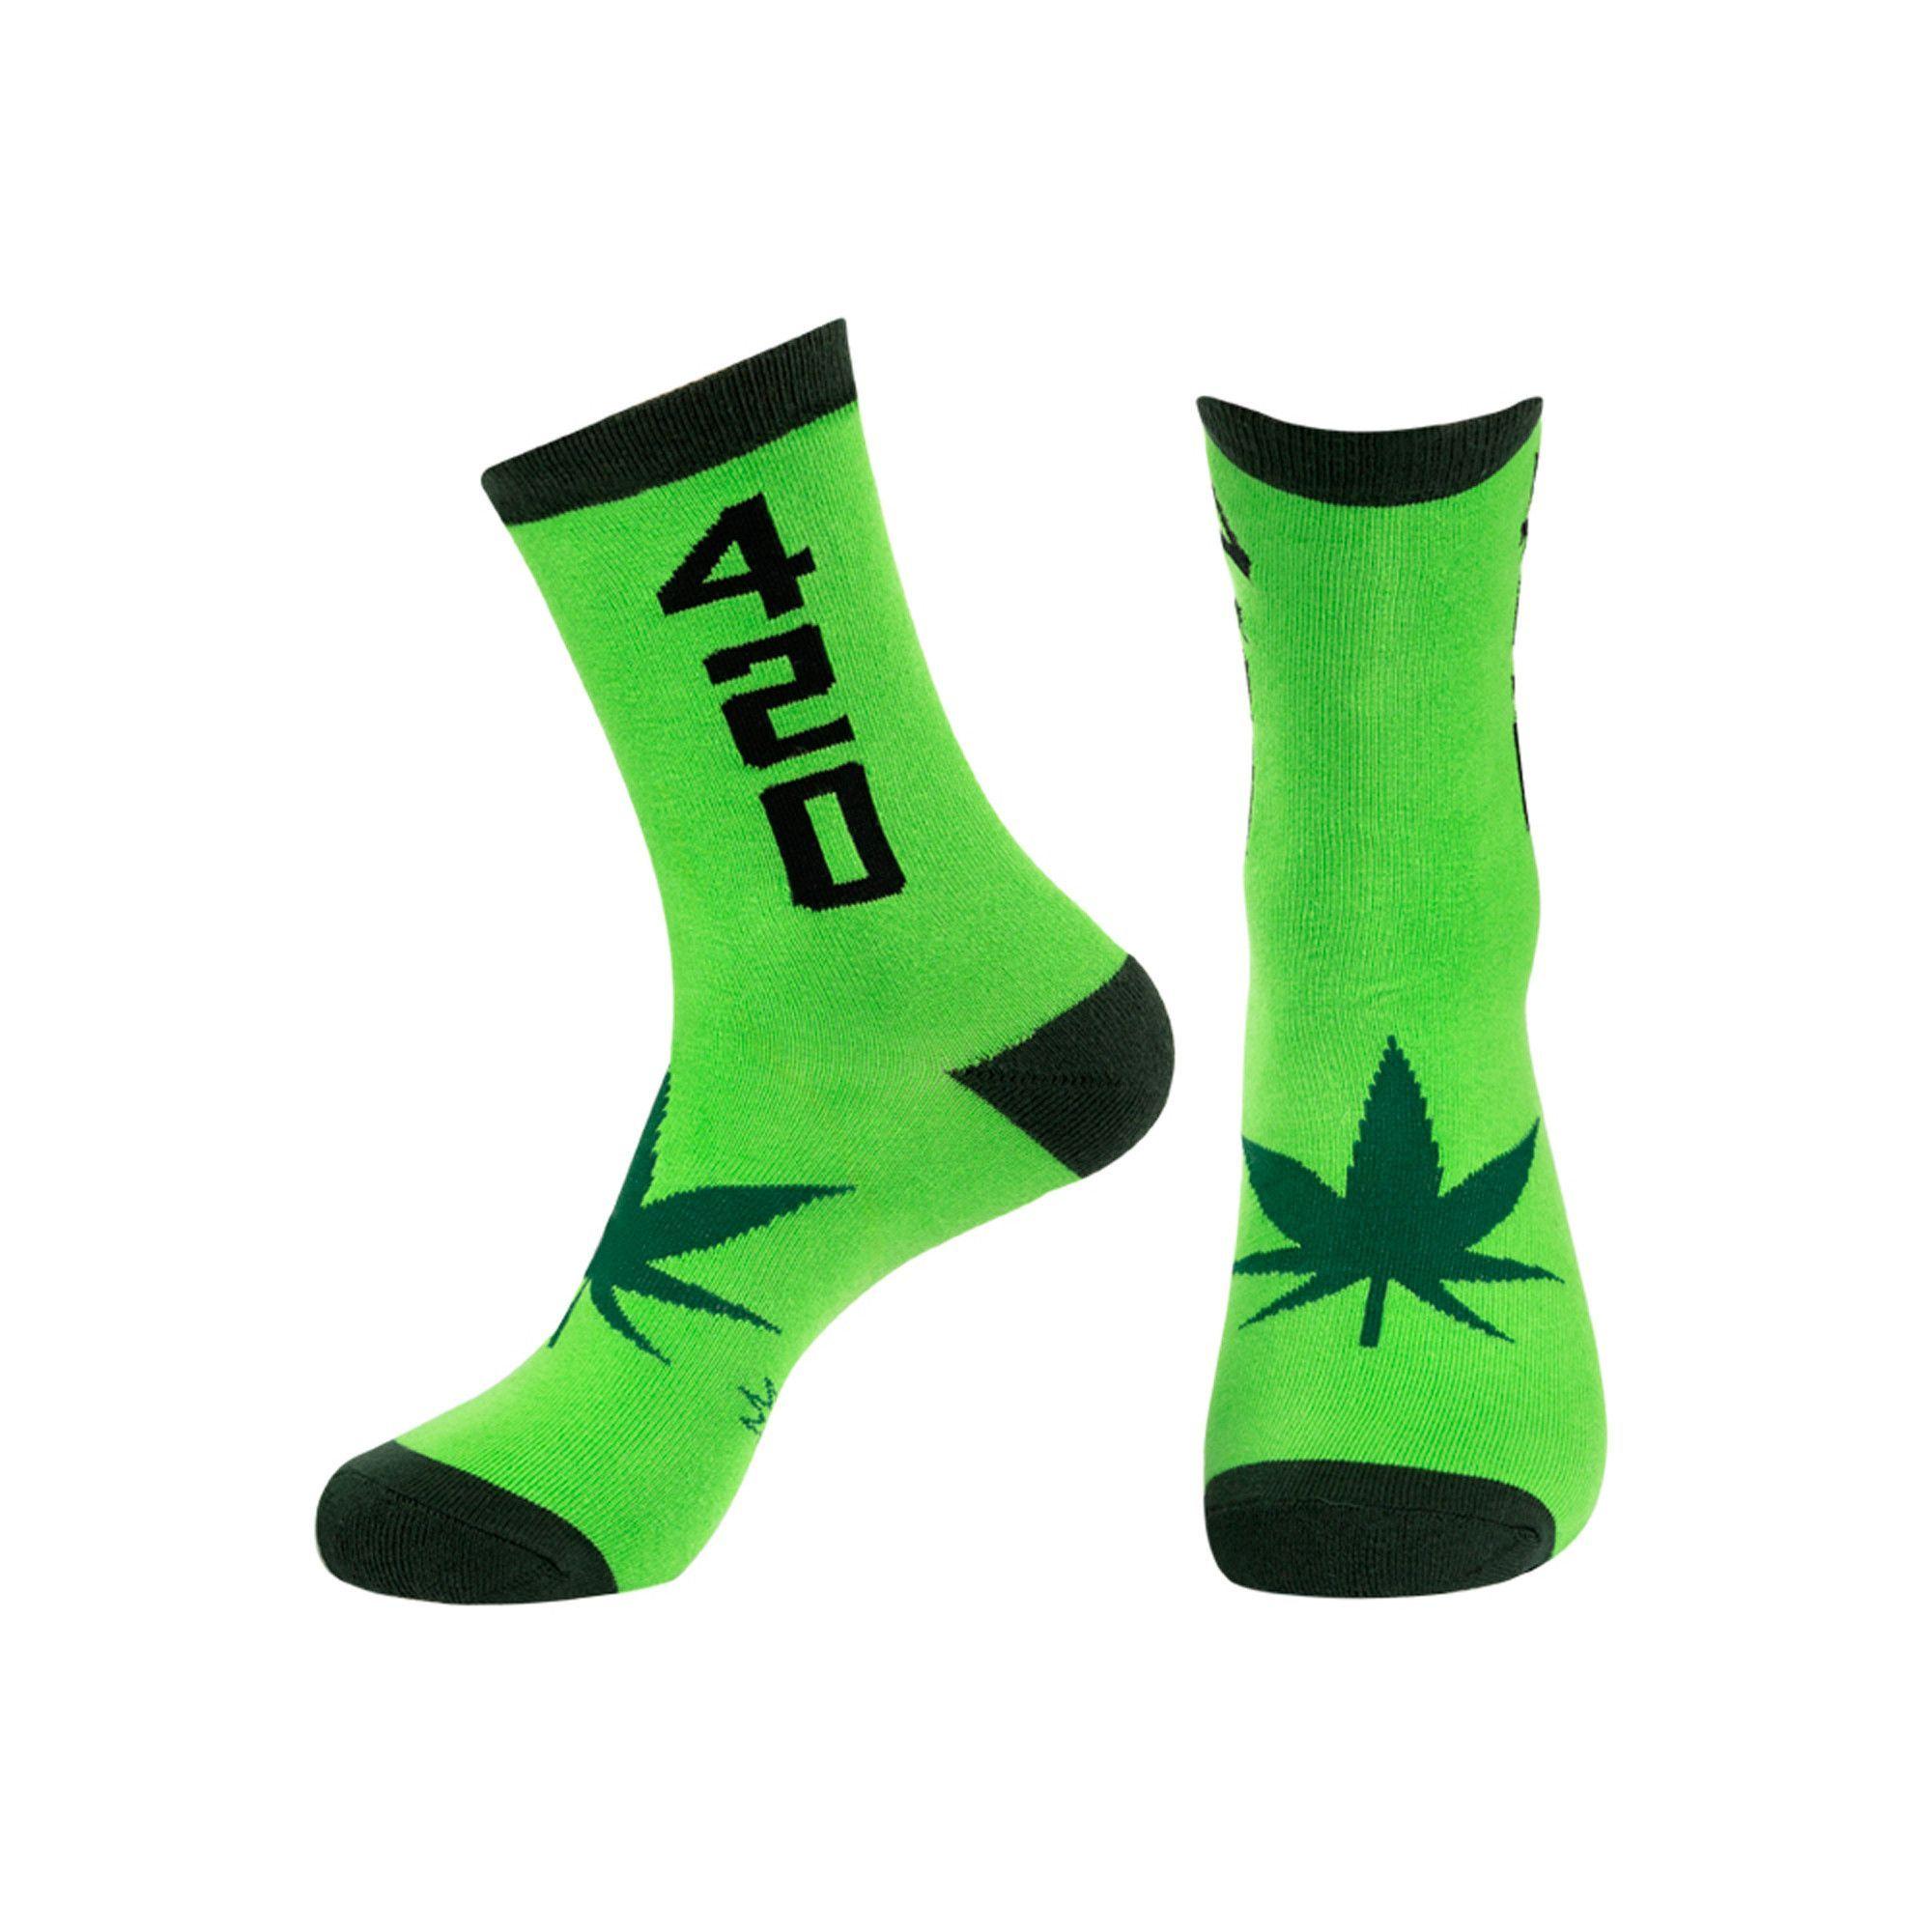 Weed Unisex Gumball Poodle Knee High Socks